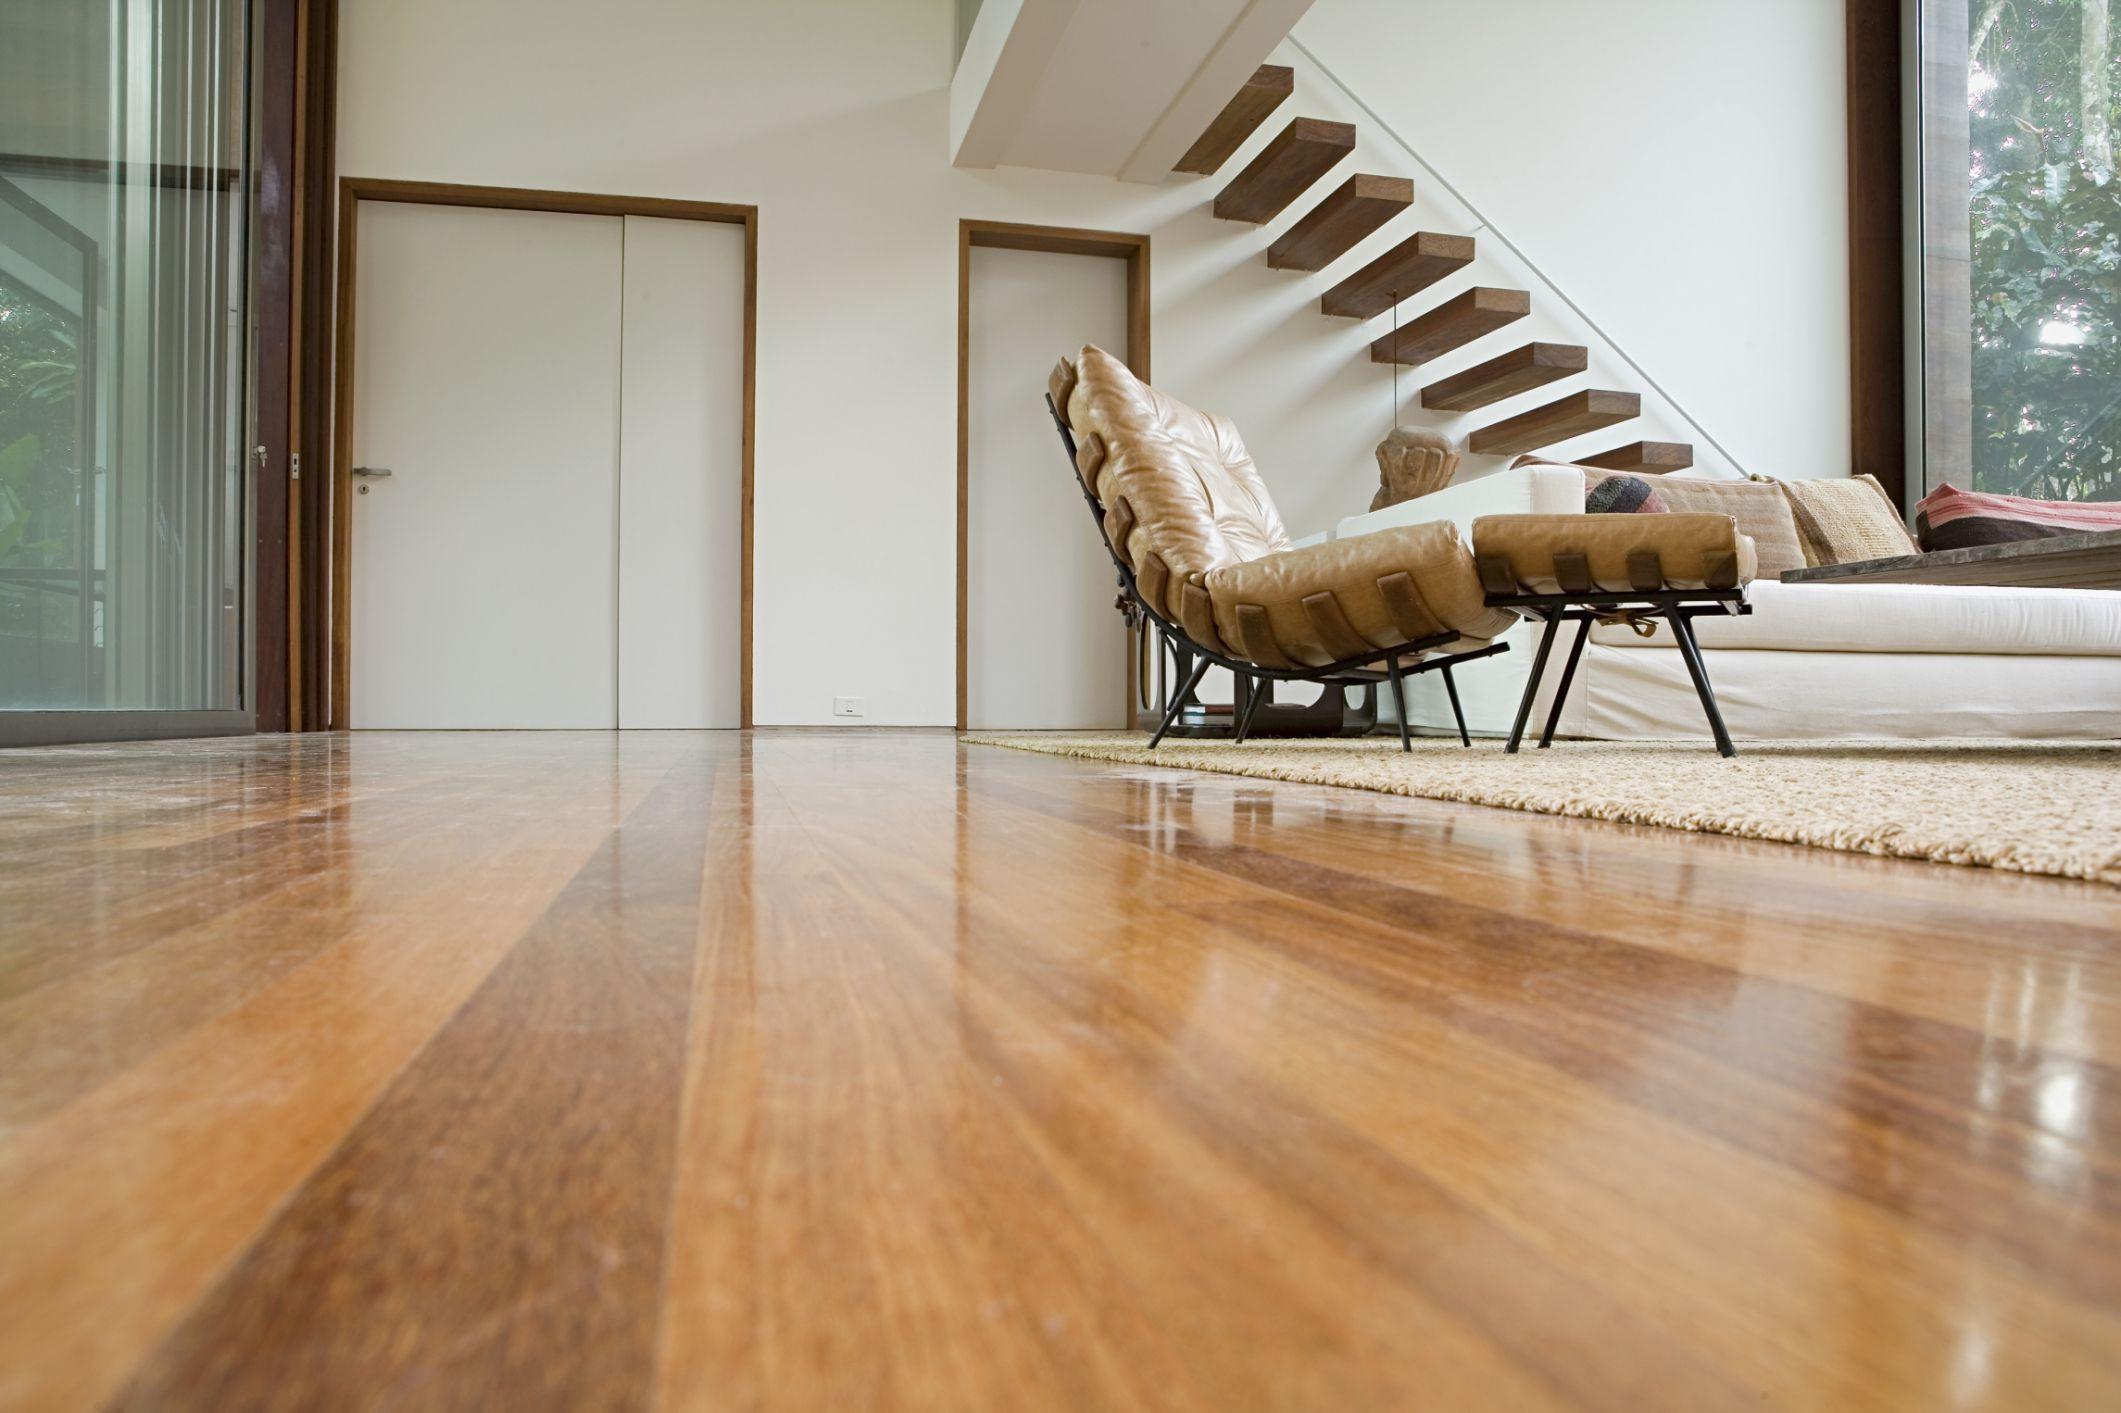 best hardwood floors to buy of engineered wood flooring vs solid wood flooring pertaining to 200571260 001 highres 56a49dec5f9b58b7d0d7dc1e